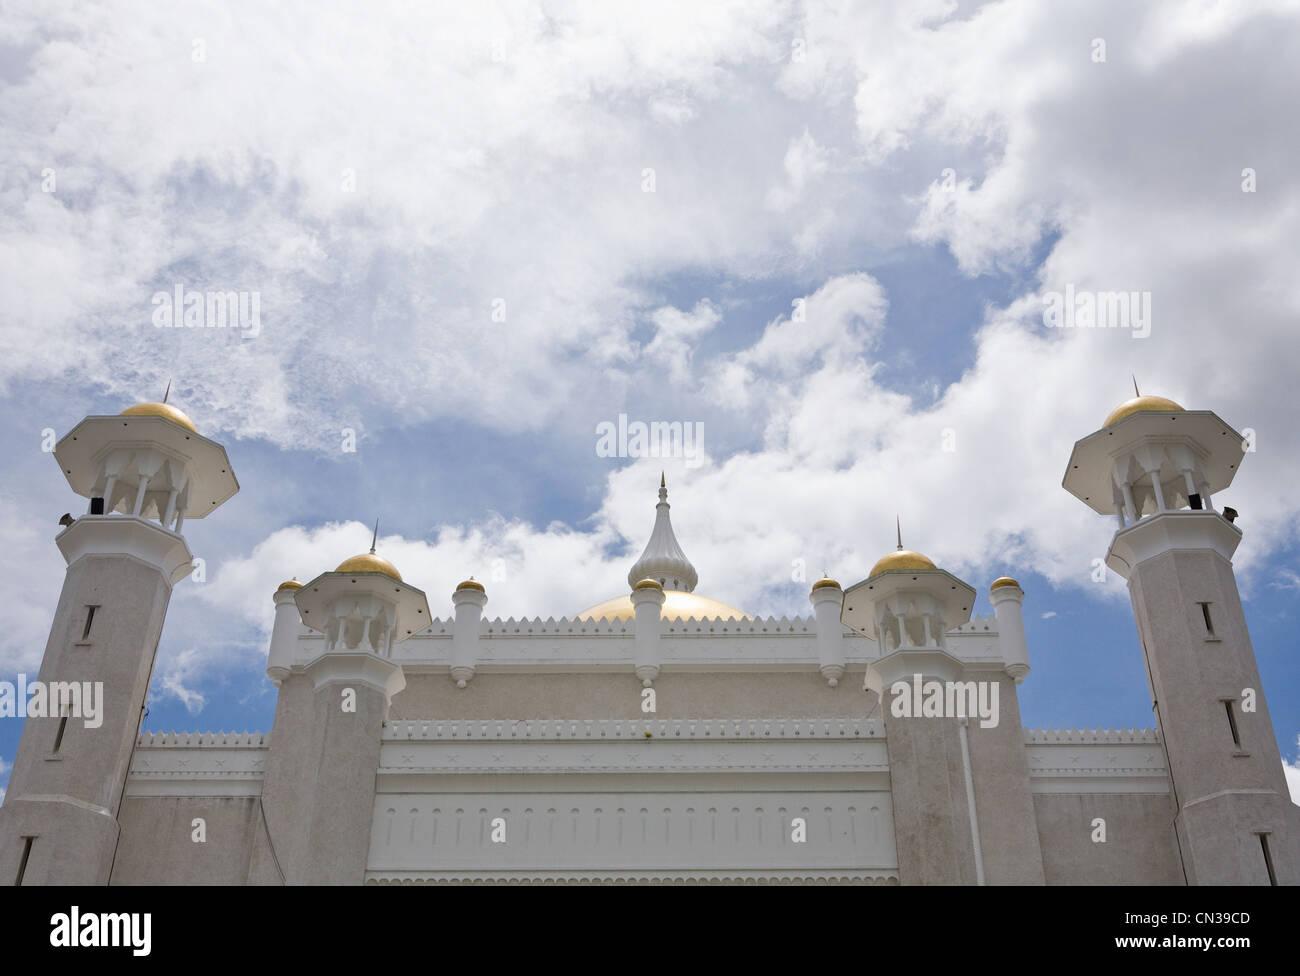 Sultan Omar Ali Saifuddin mosque, Bandar Seri Bagawan, Brunei - Stock Image